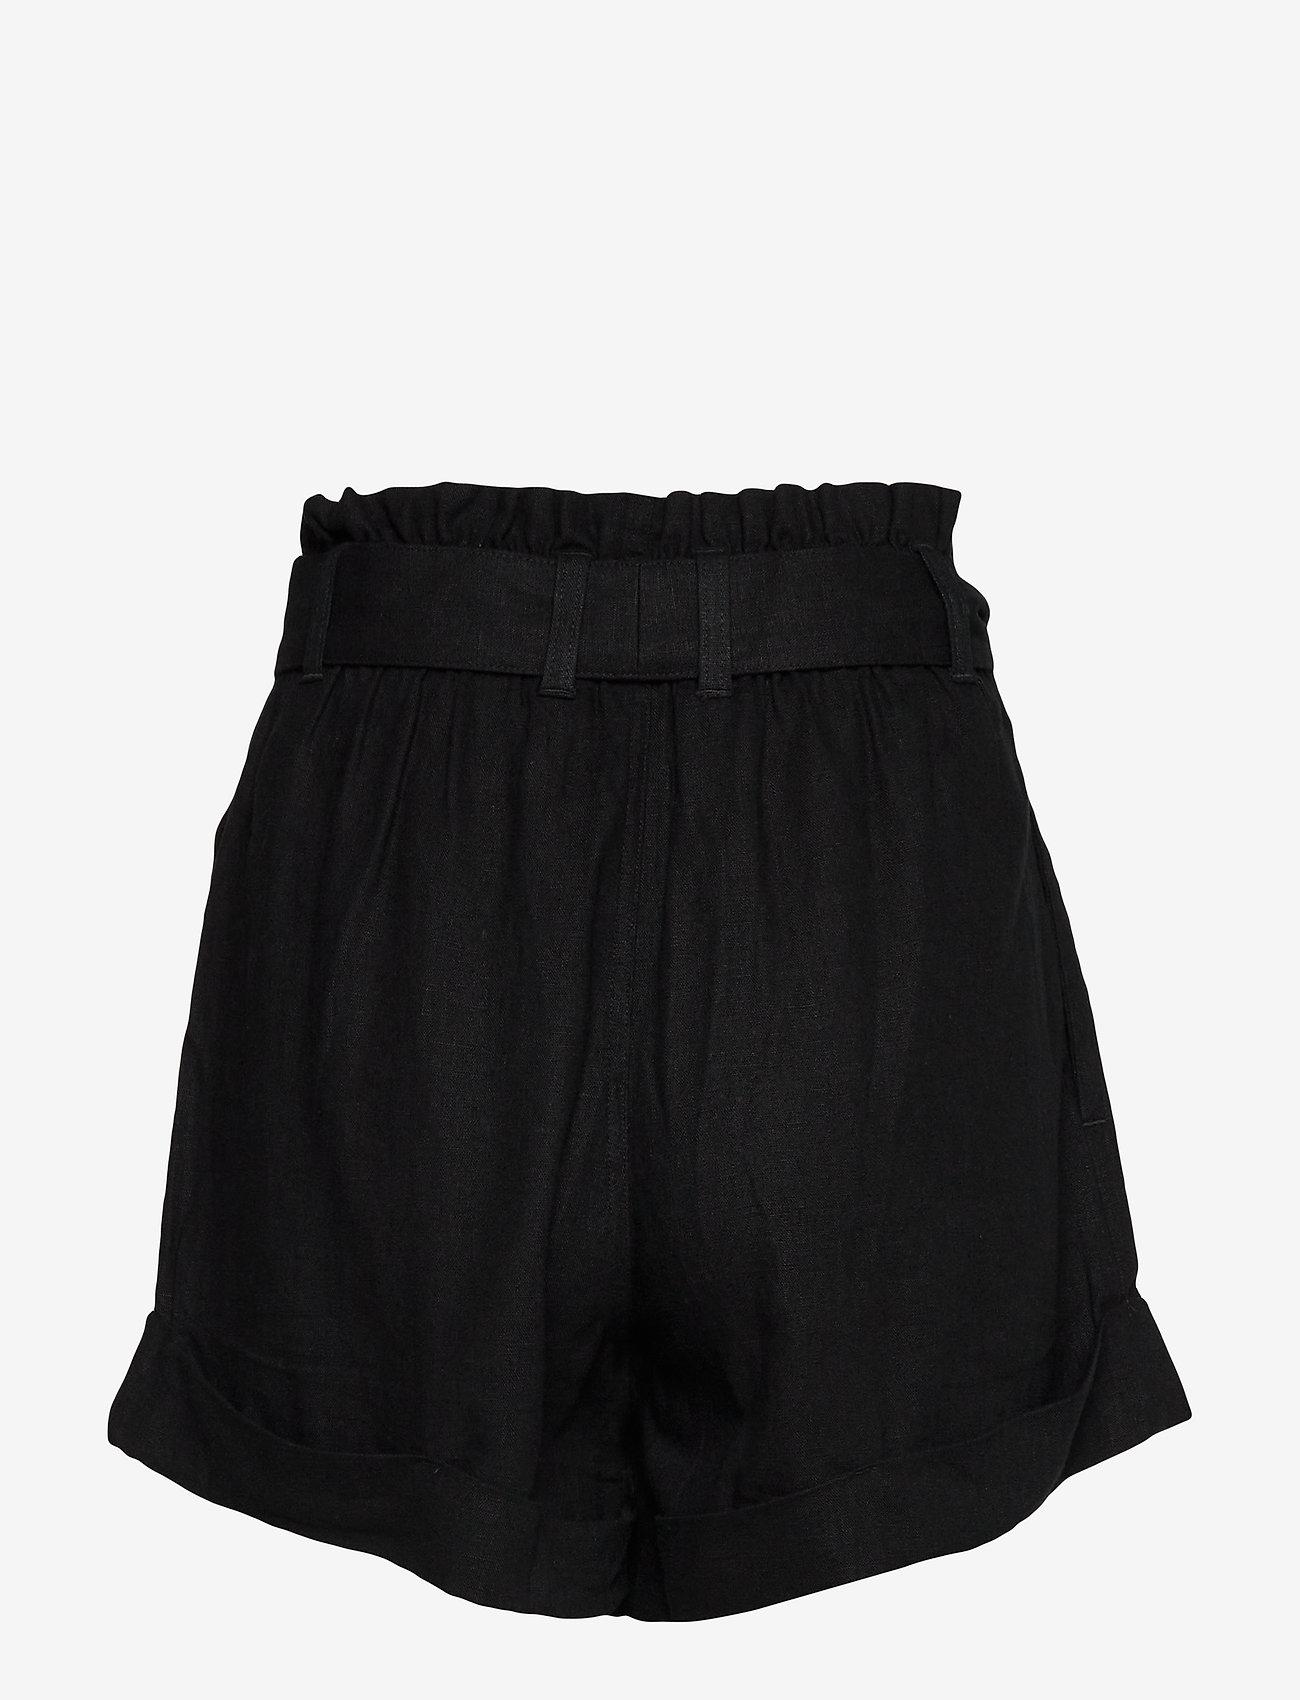 Abercrombie & Fitch - Shorts - paper bag shorts - black dd - 1